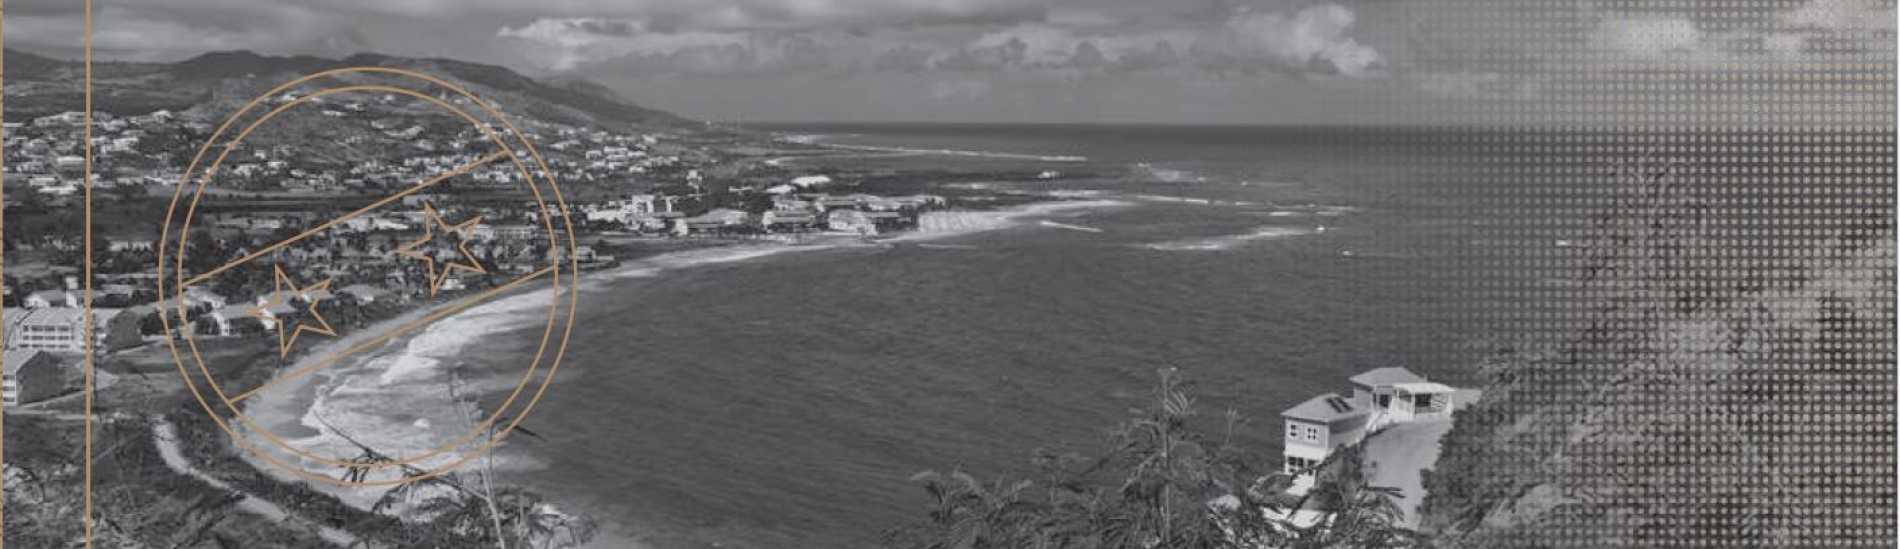 St. Kitts & Nevis - Citizenship by Investment Program